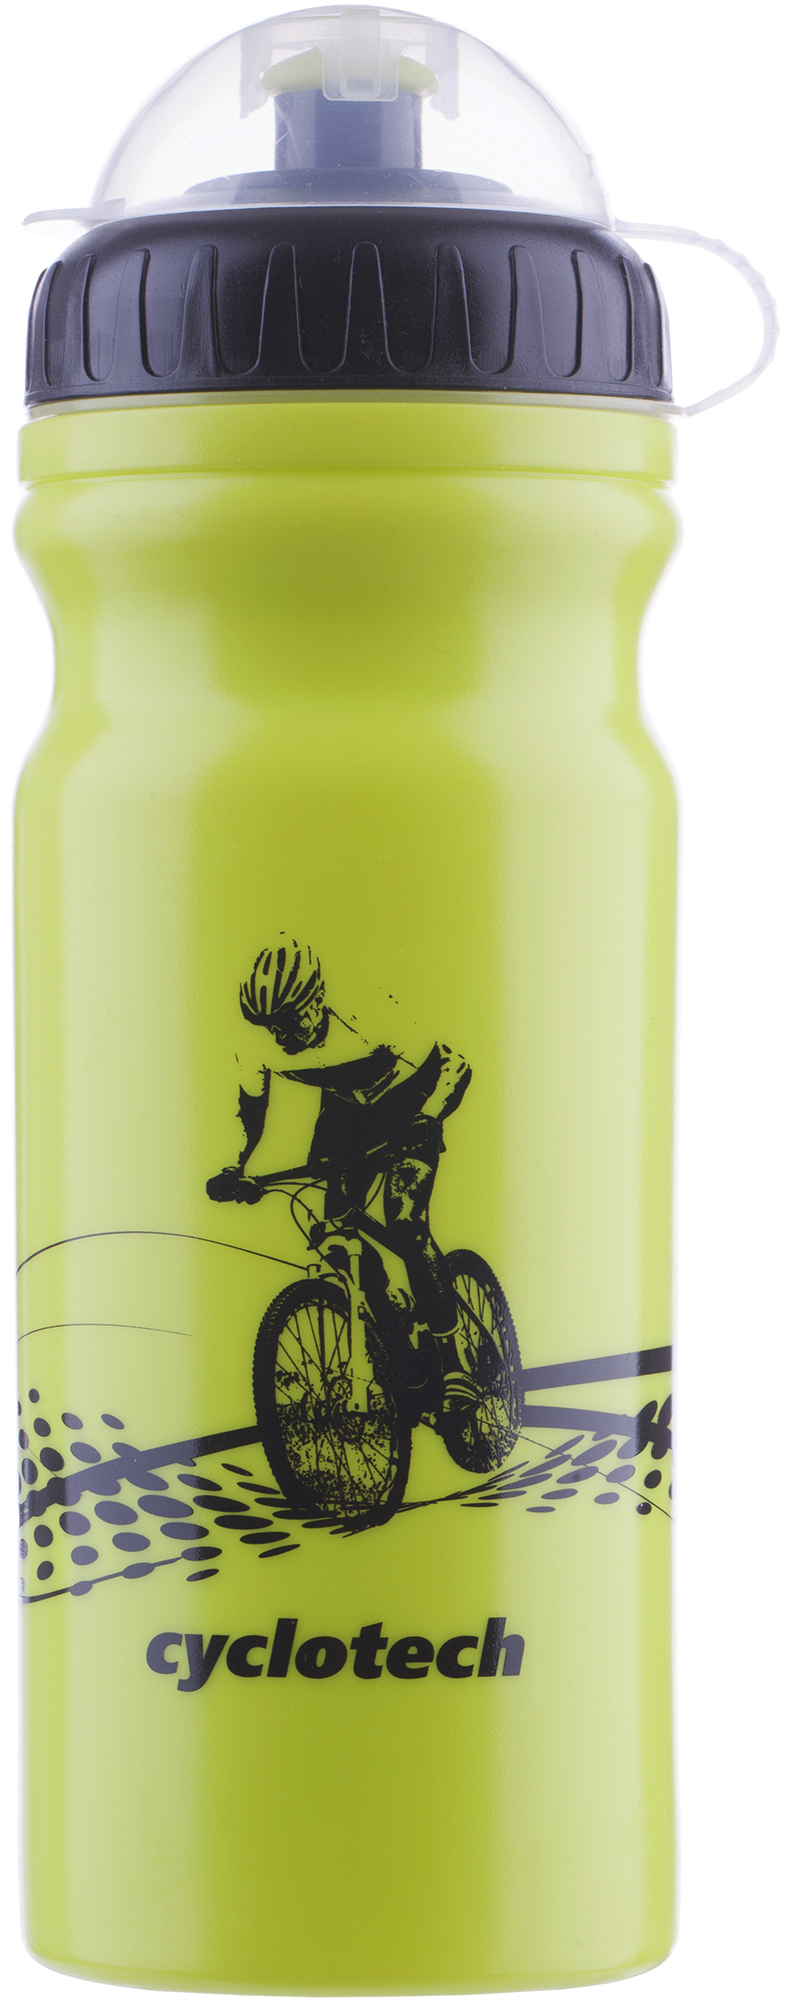 Cyclotech Фляжка велосипедная Cyclotech, размер Без размера